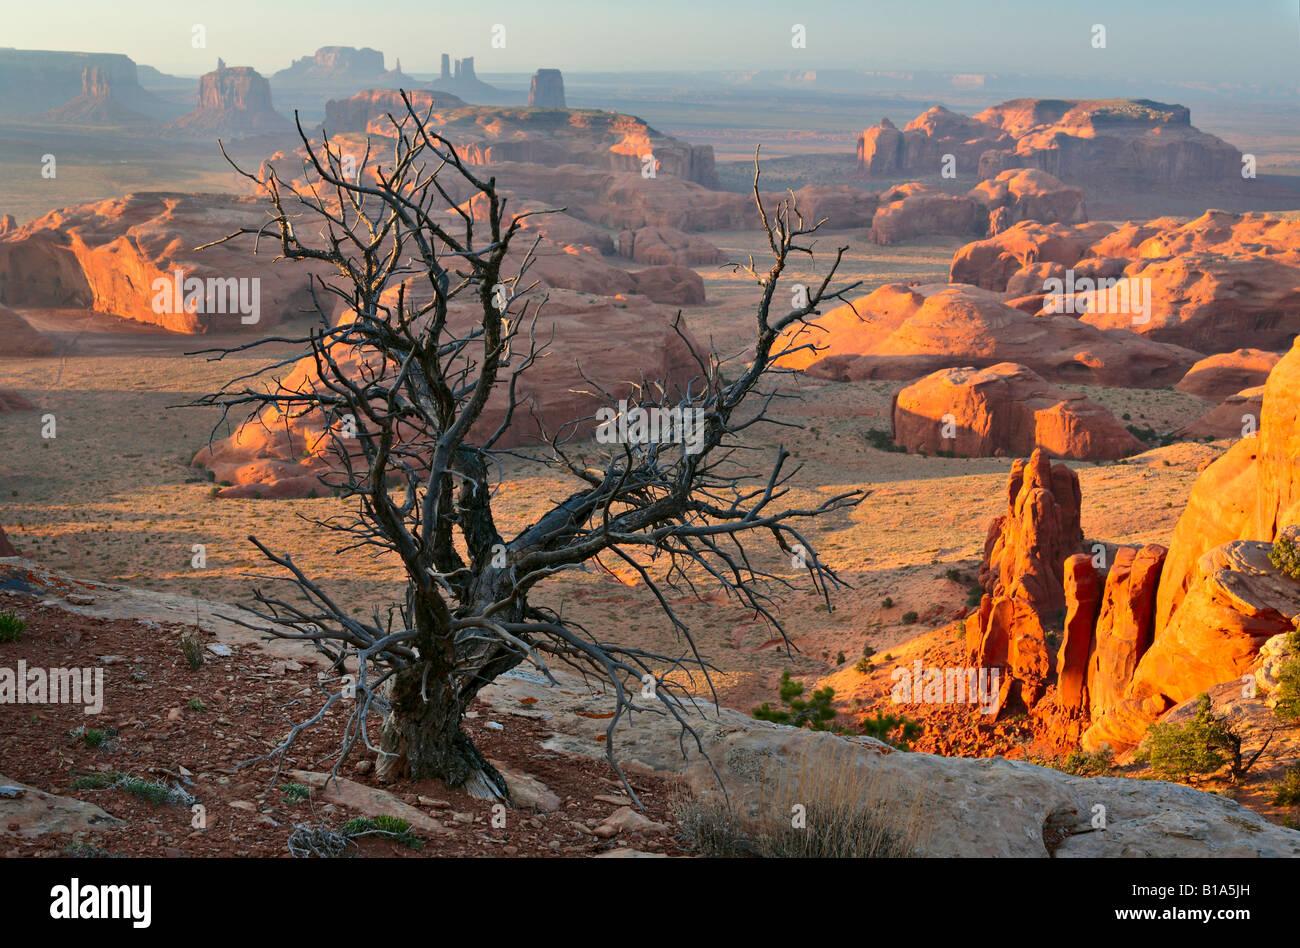 Dead tree on Hunt's Mesa in Monument Valley, Arizona - Stock Image